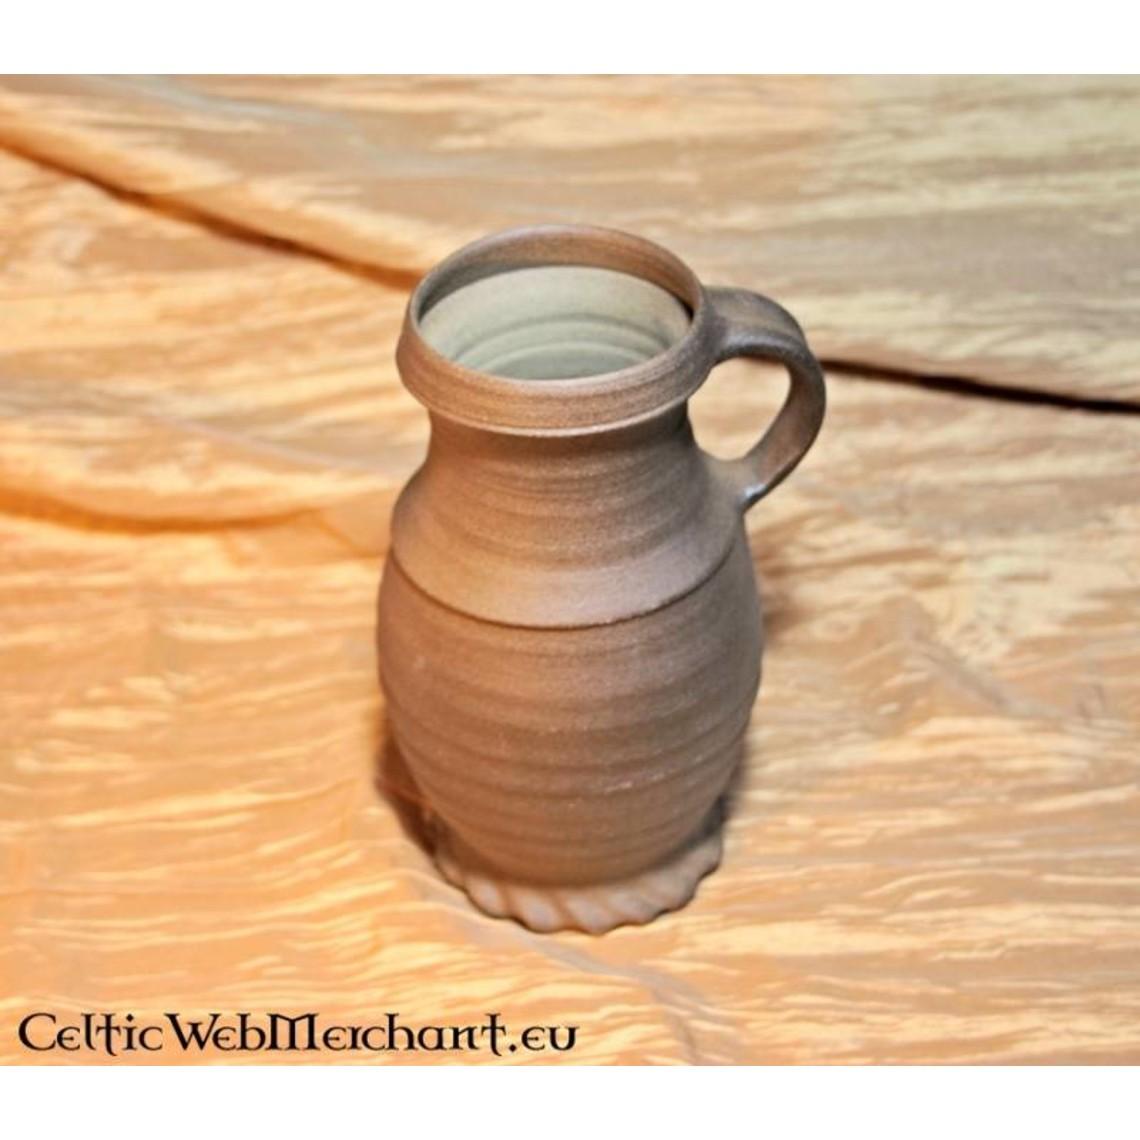 13de eeuwse cilinderhalskruik